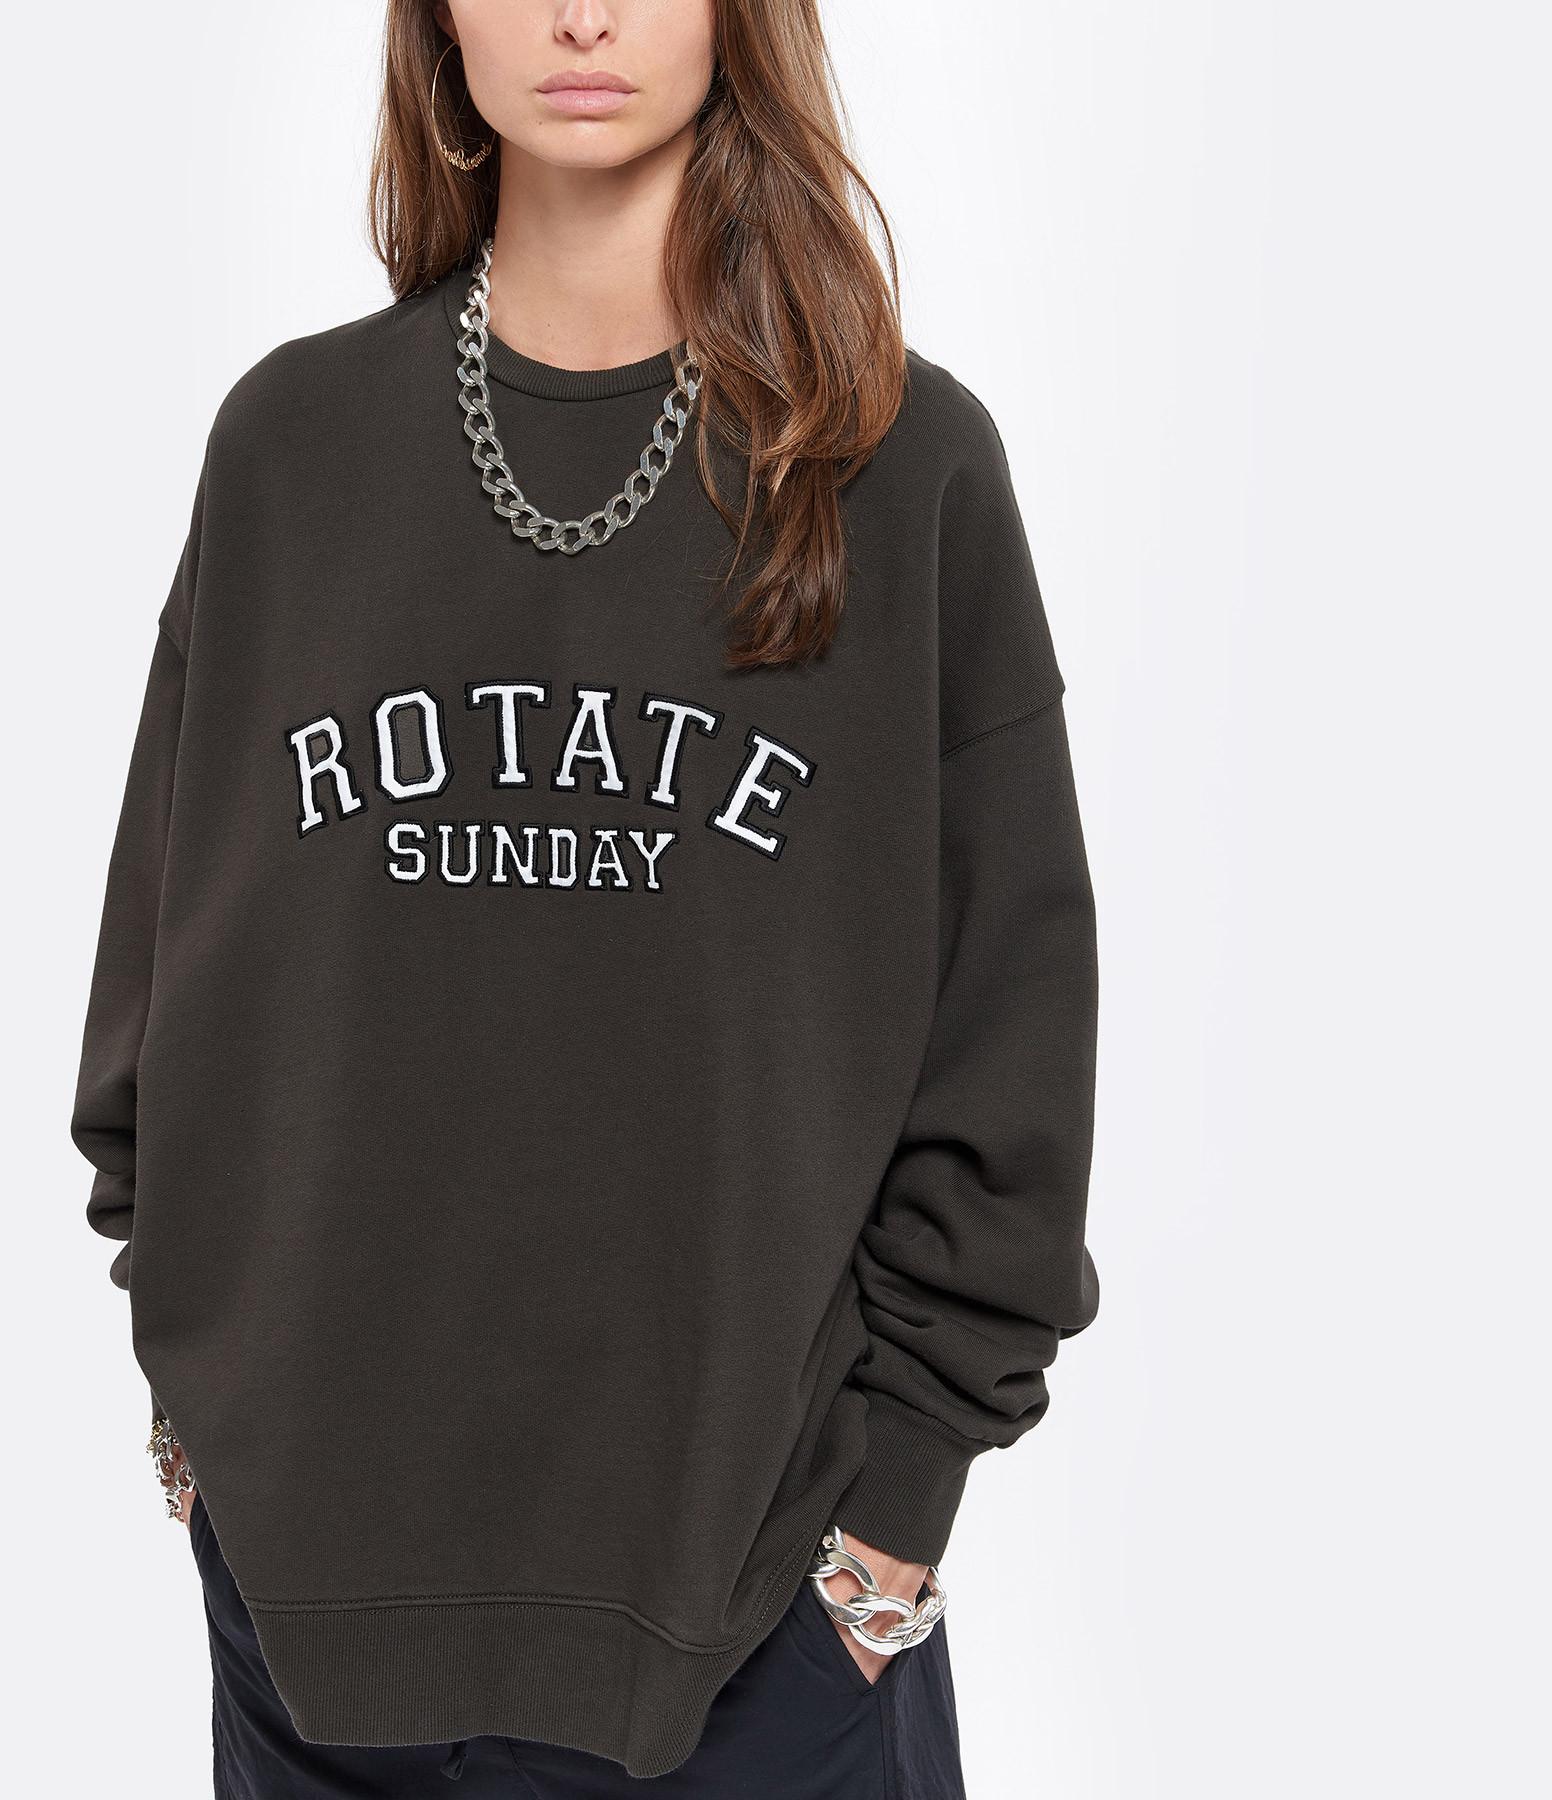 ROTATE - Sweatshirt Iris Coton Biologique Noir, Capsule Sun